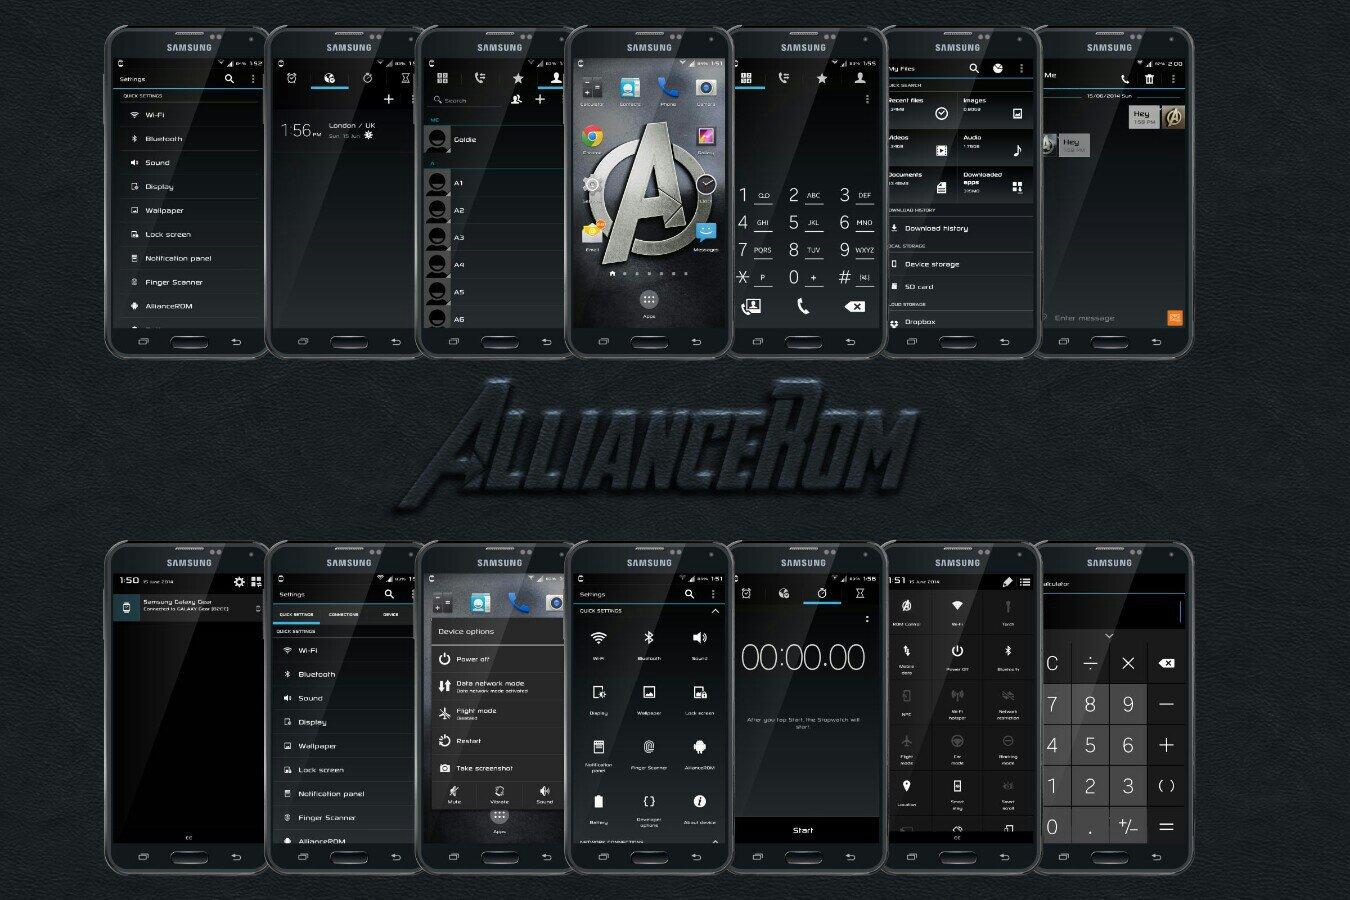 alliance-rom-s5-top-galaxy-s5-roms